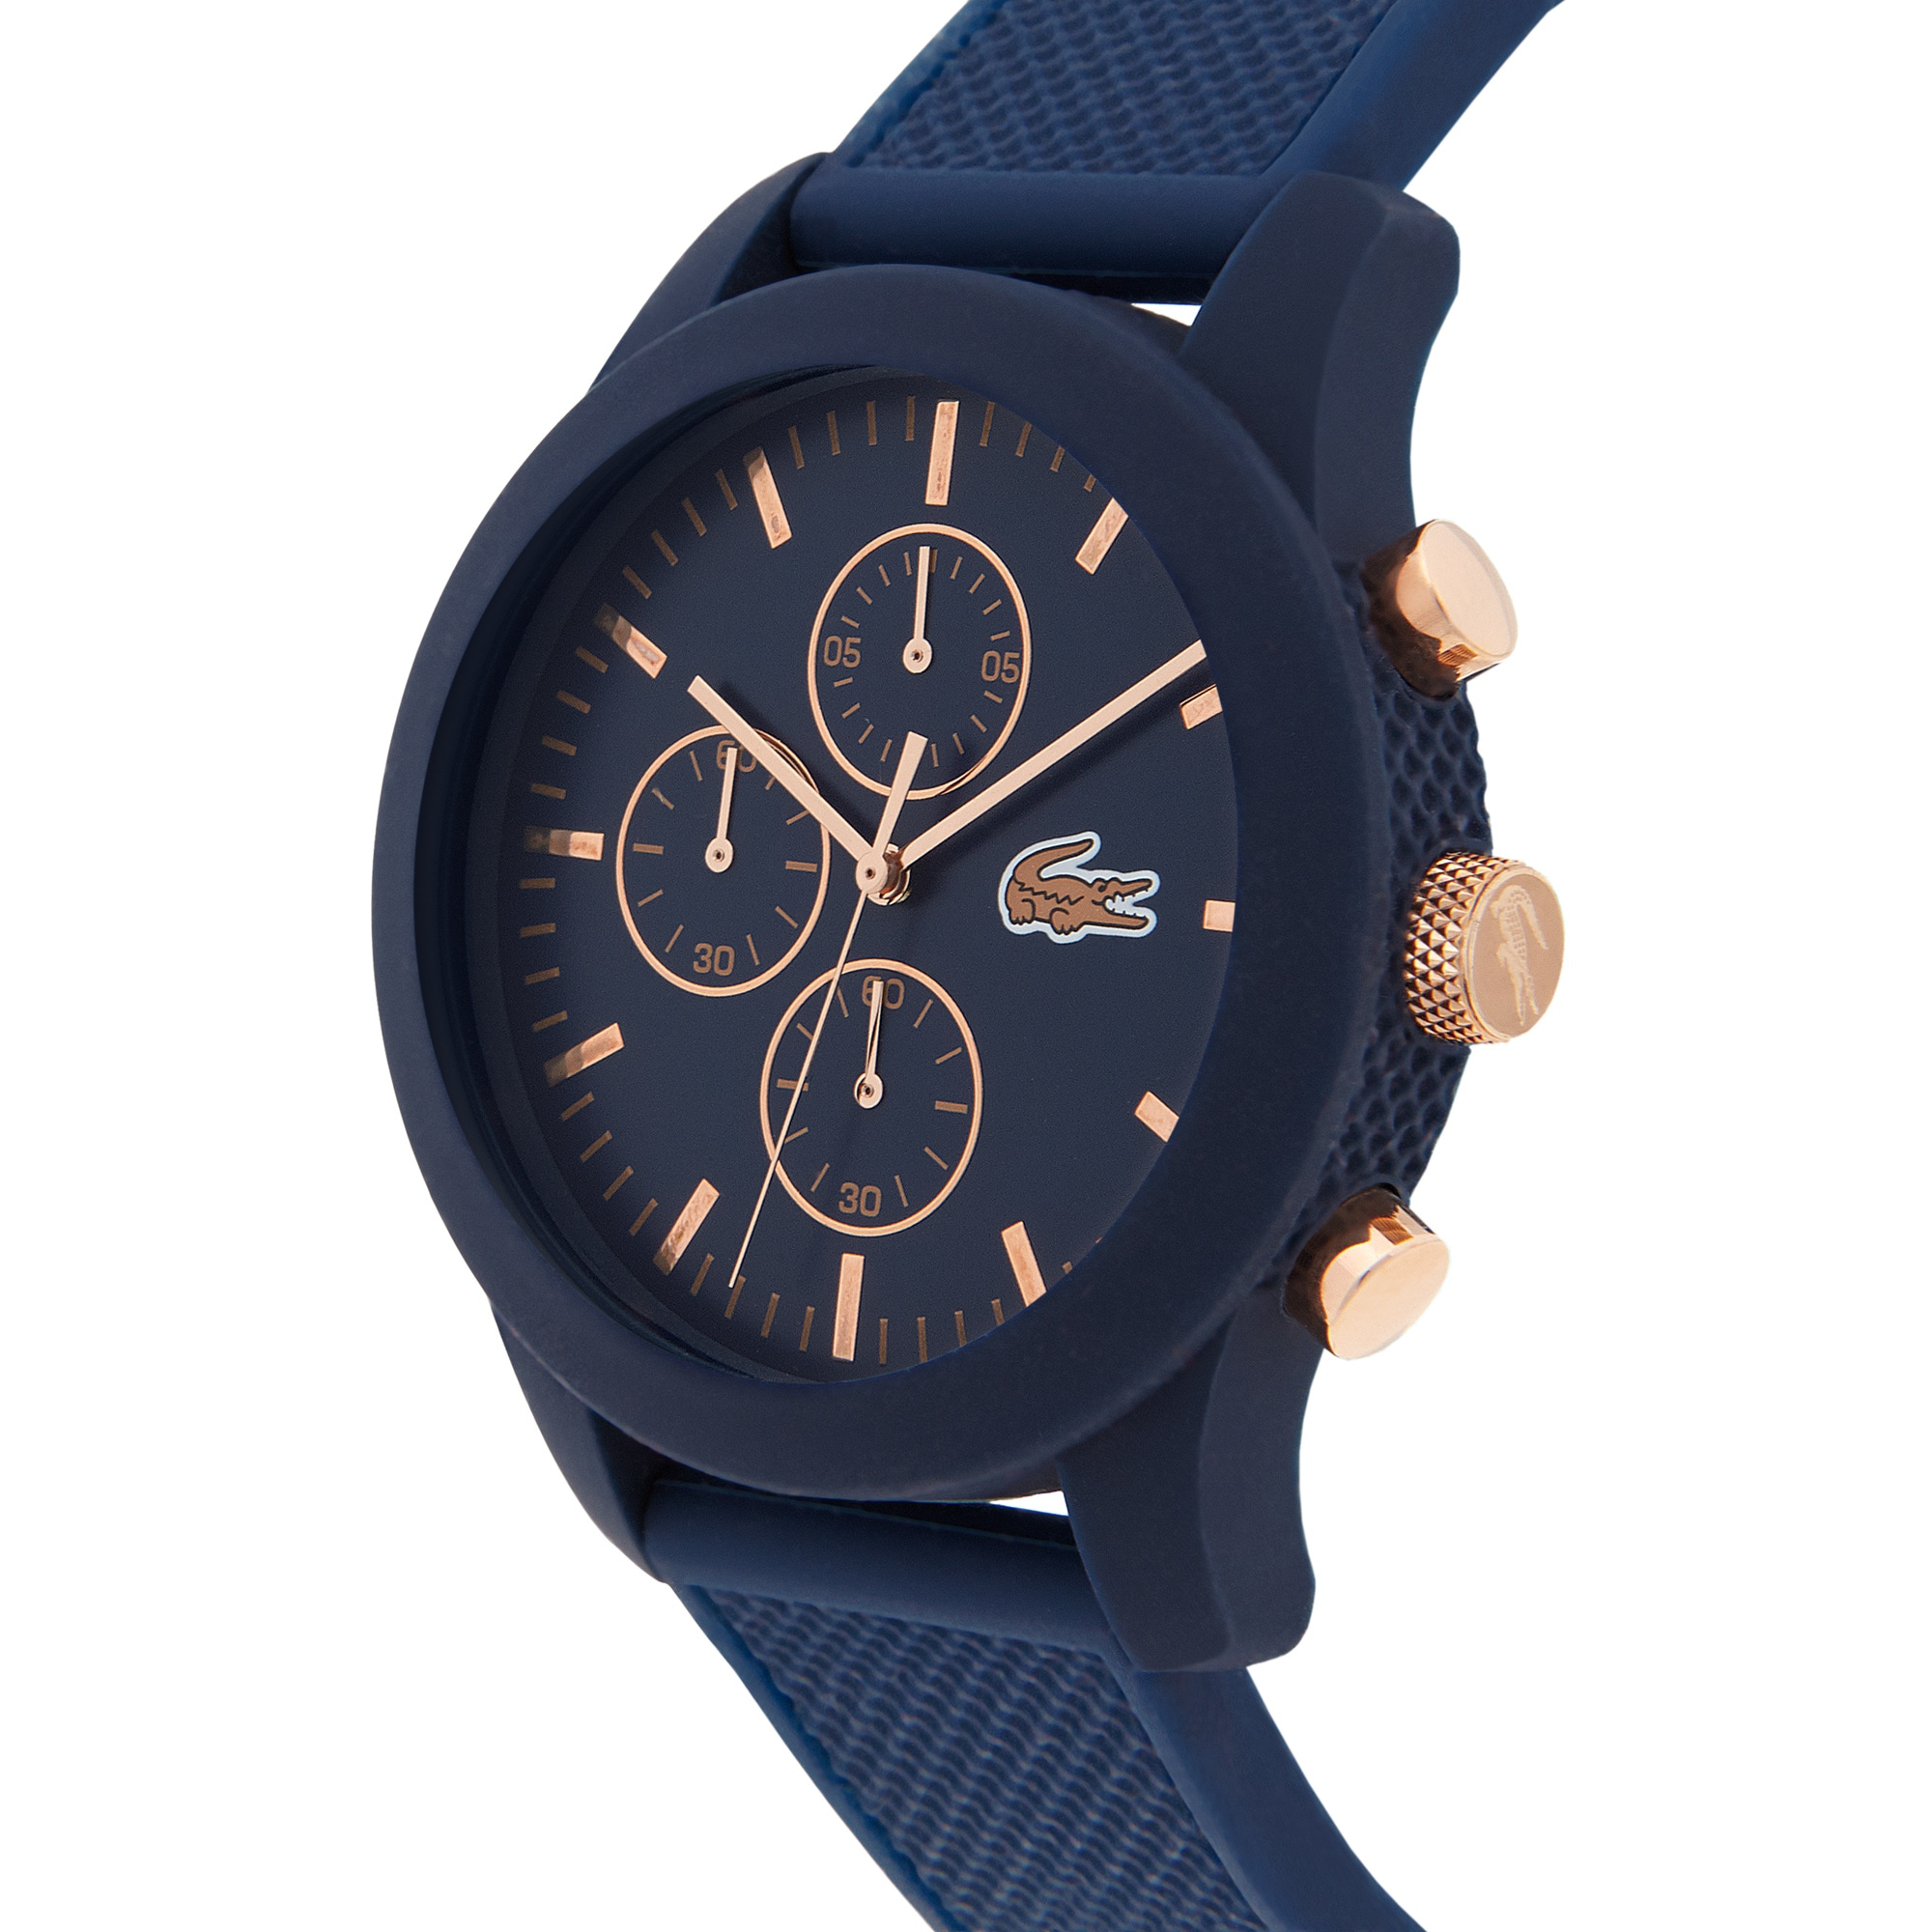 LACOSTE 12.12 Herren-Chronograph mit blauem Silikonband